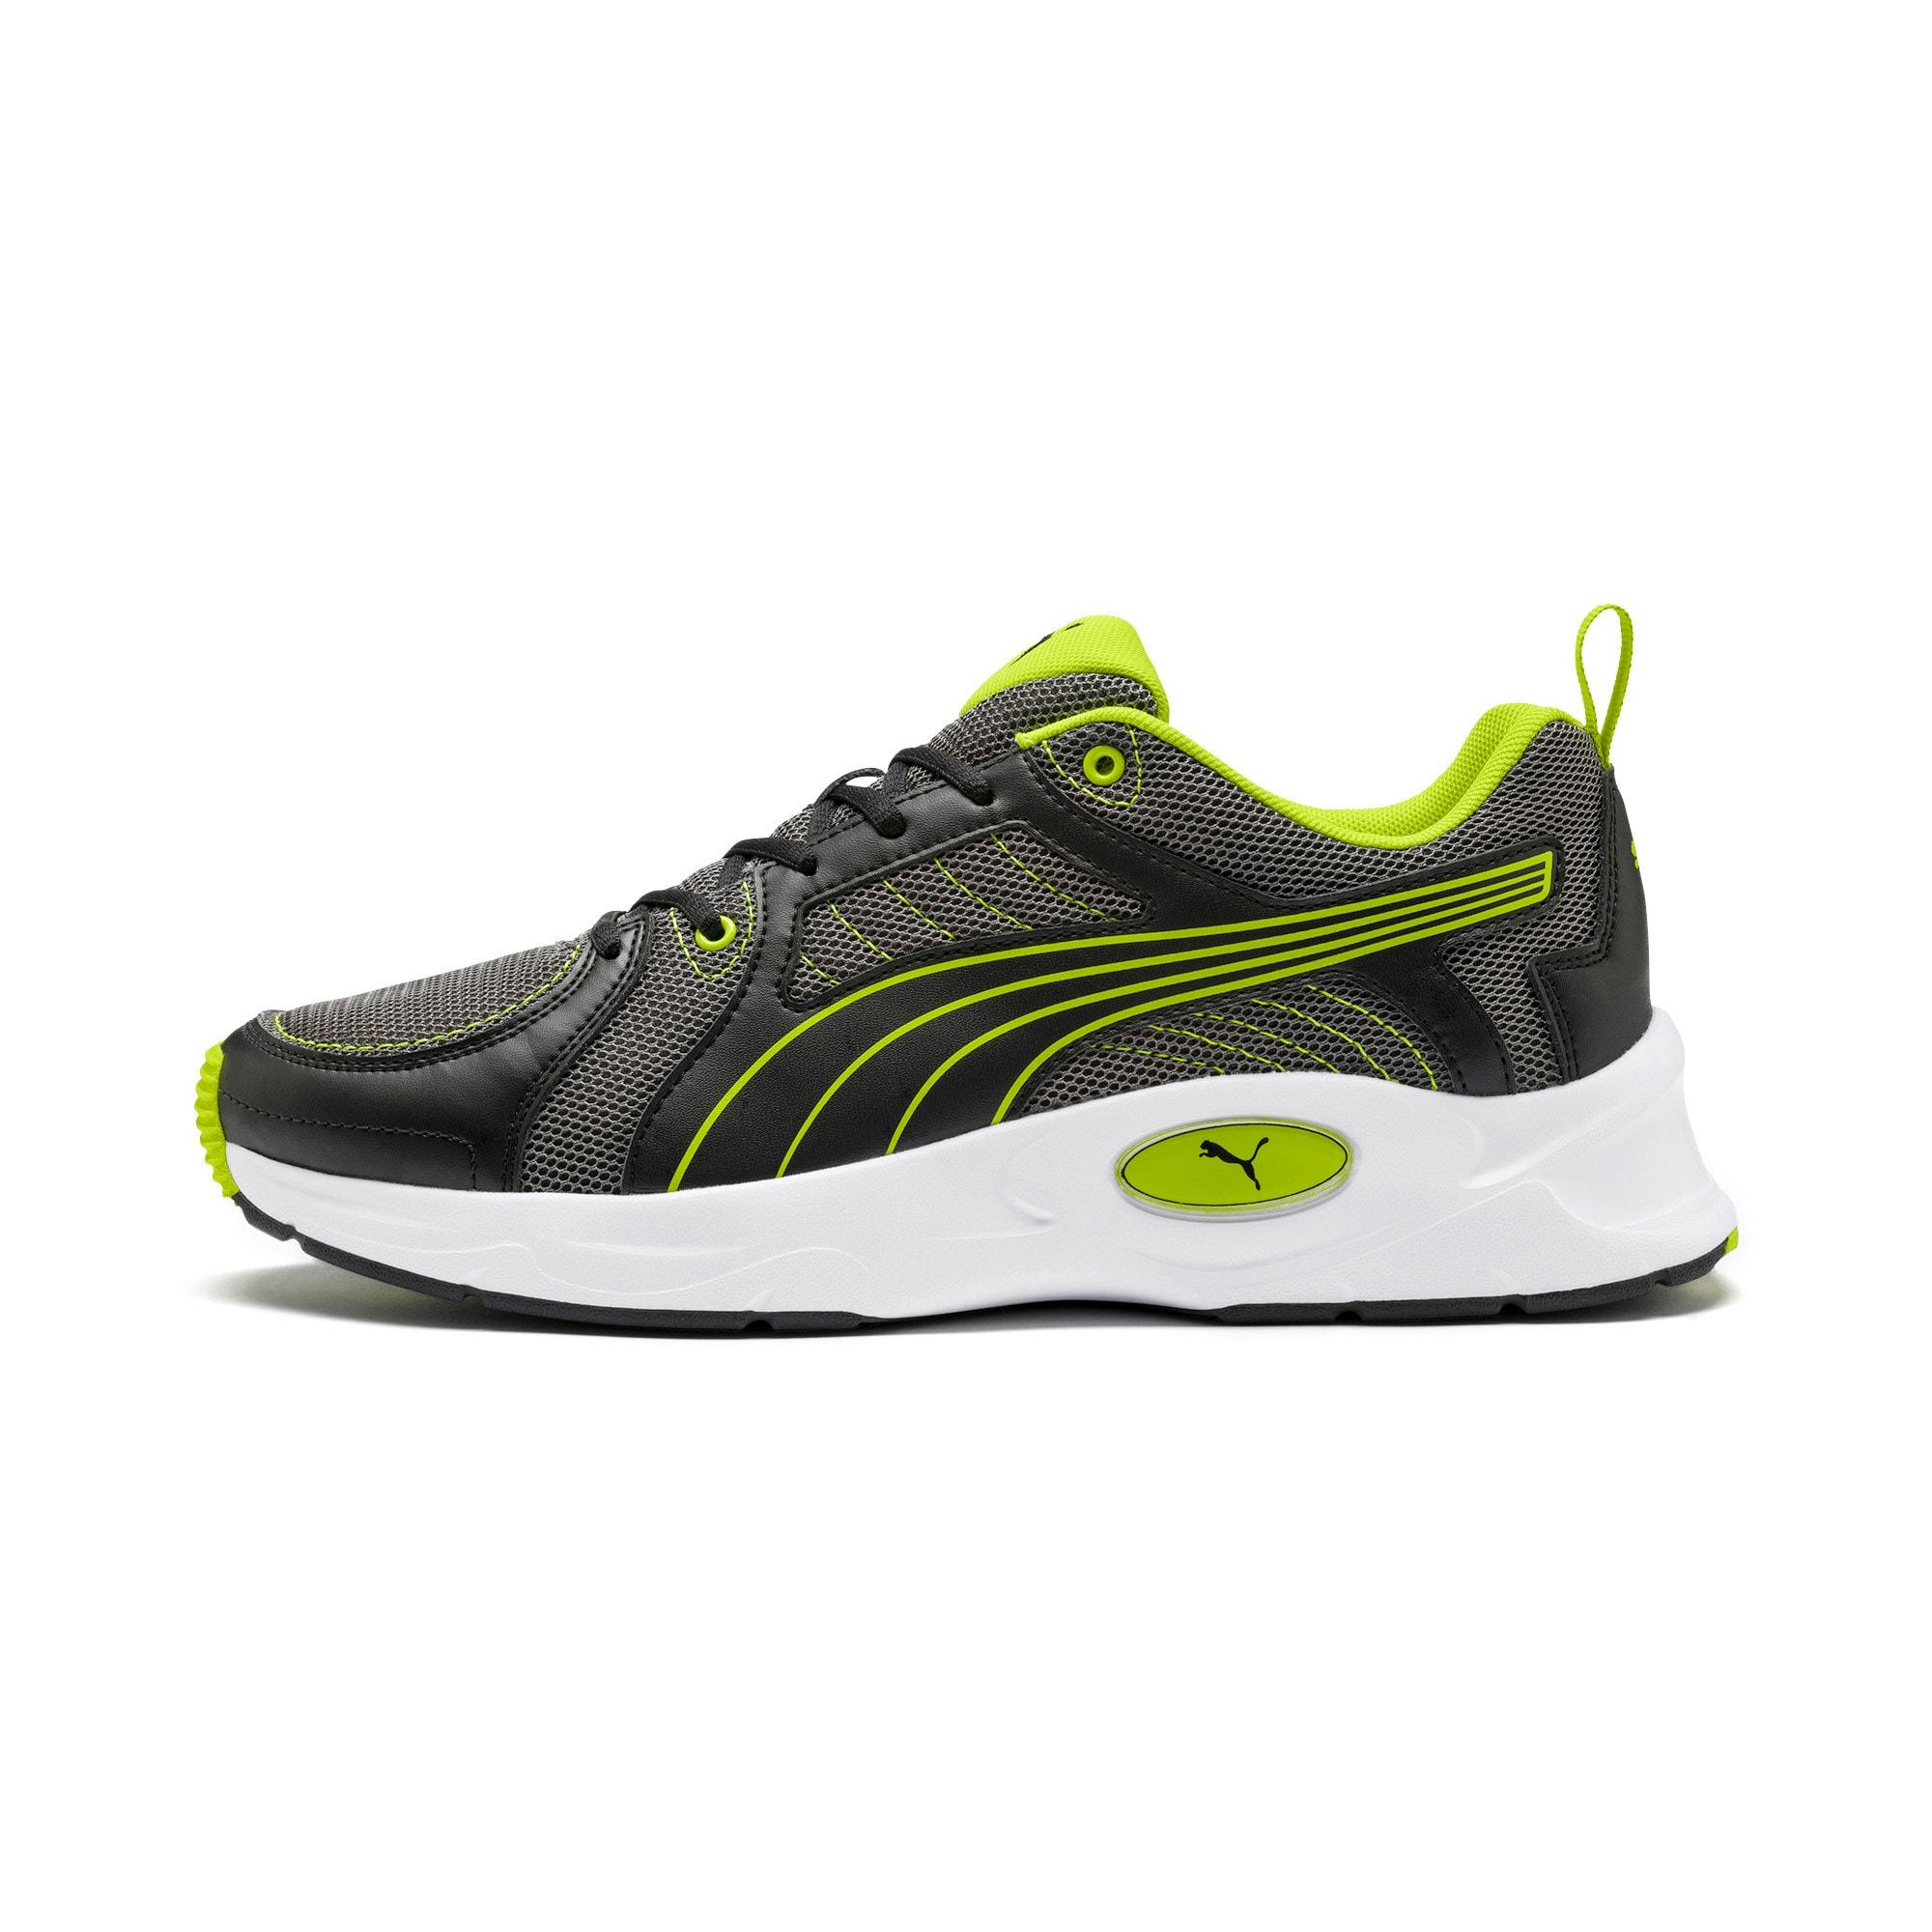 Thumbnail 1 of Nucleus Run Training Shoes, CASTLEROCK-Limepunch, medium